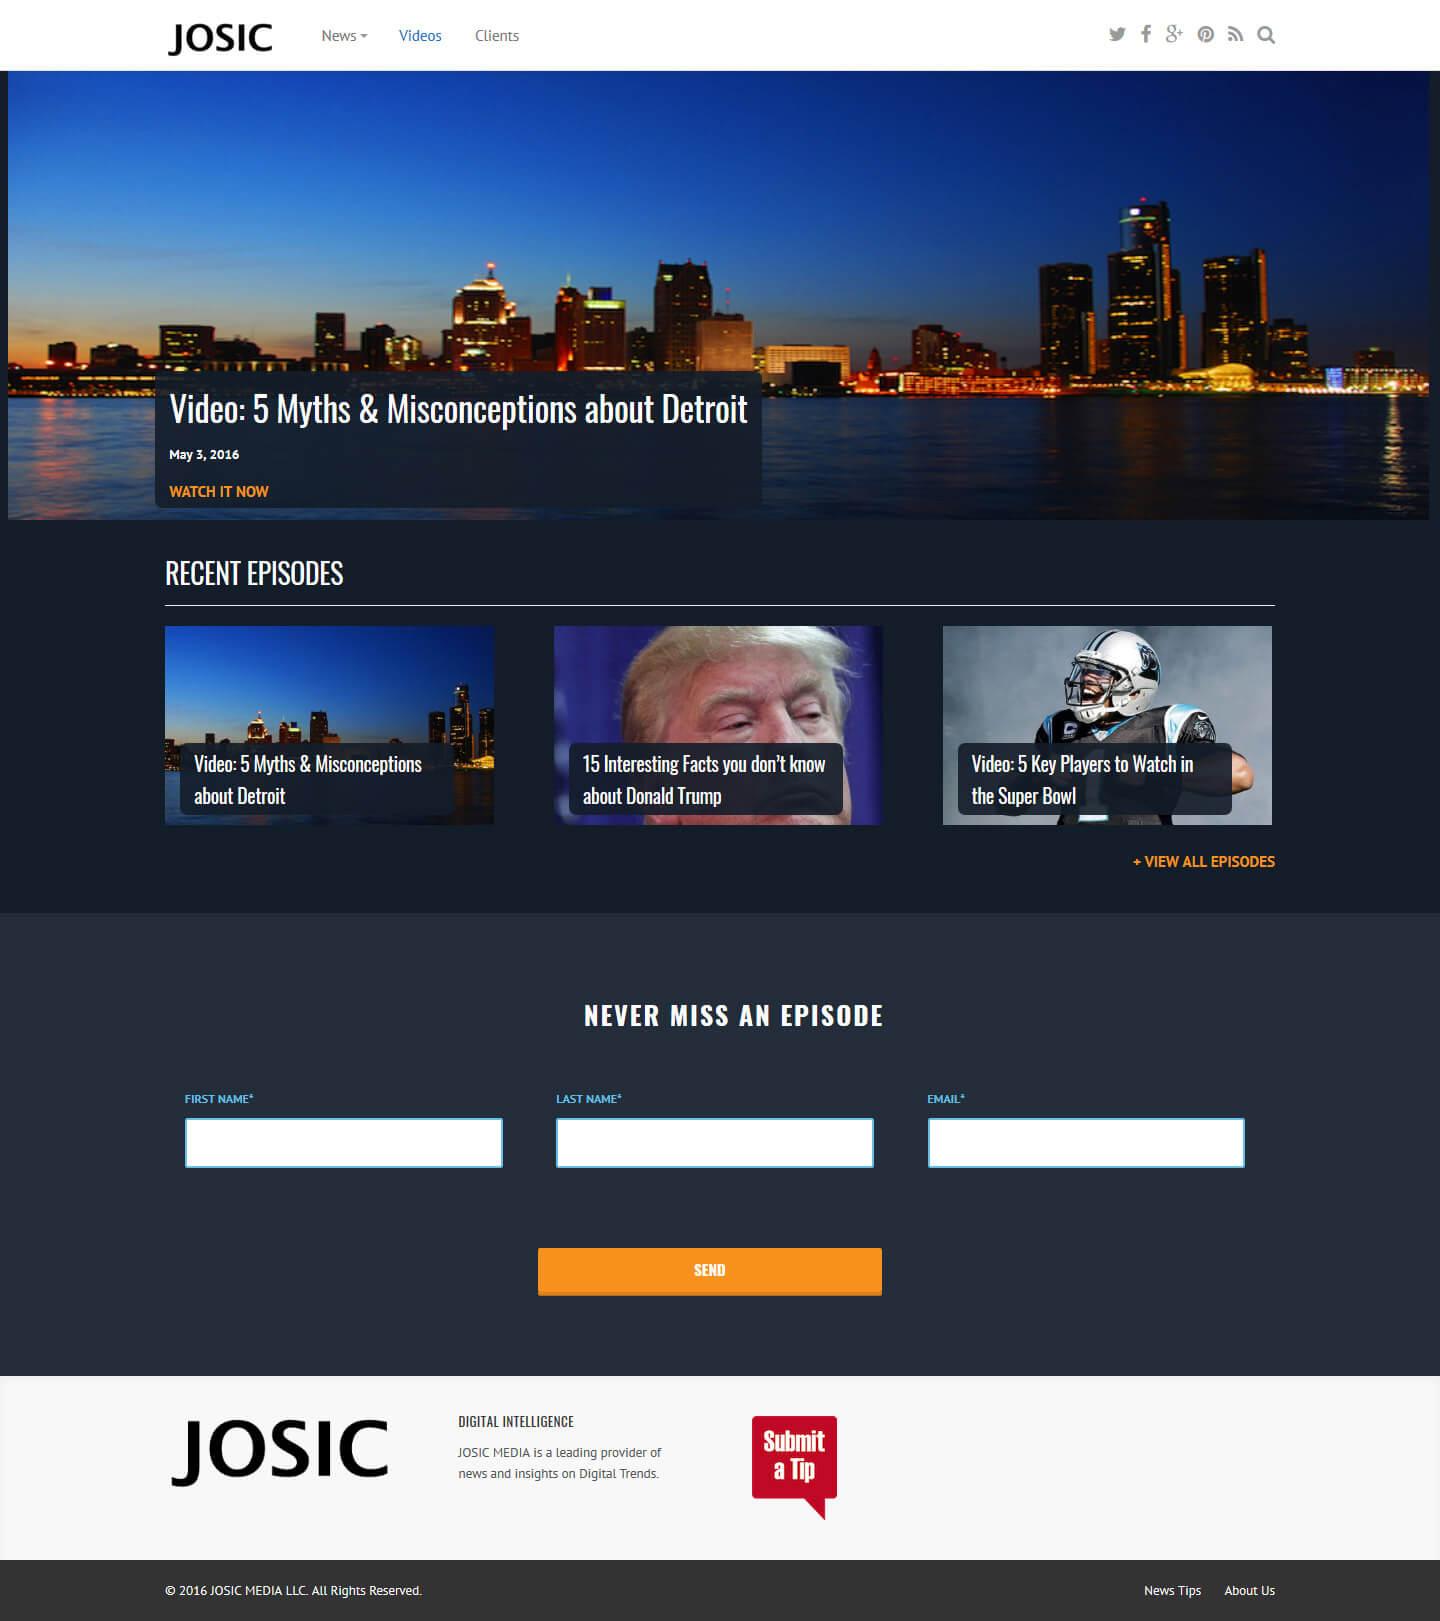 JOSIC - Digital Intelligence